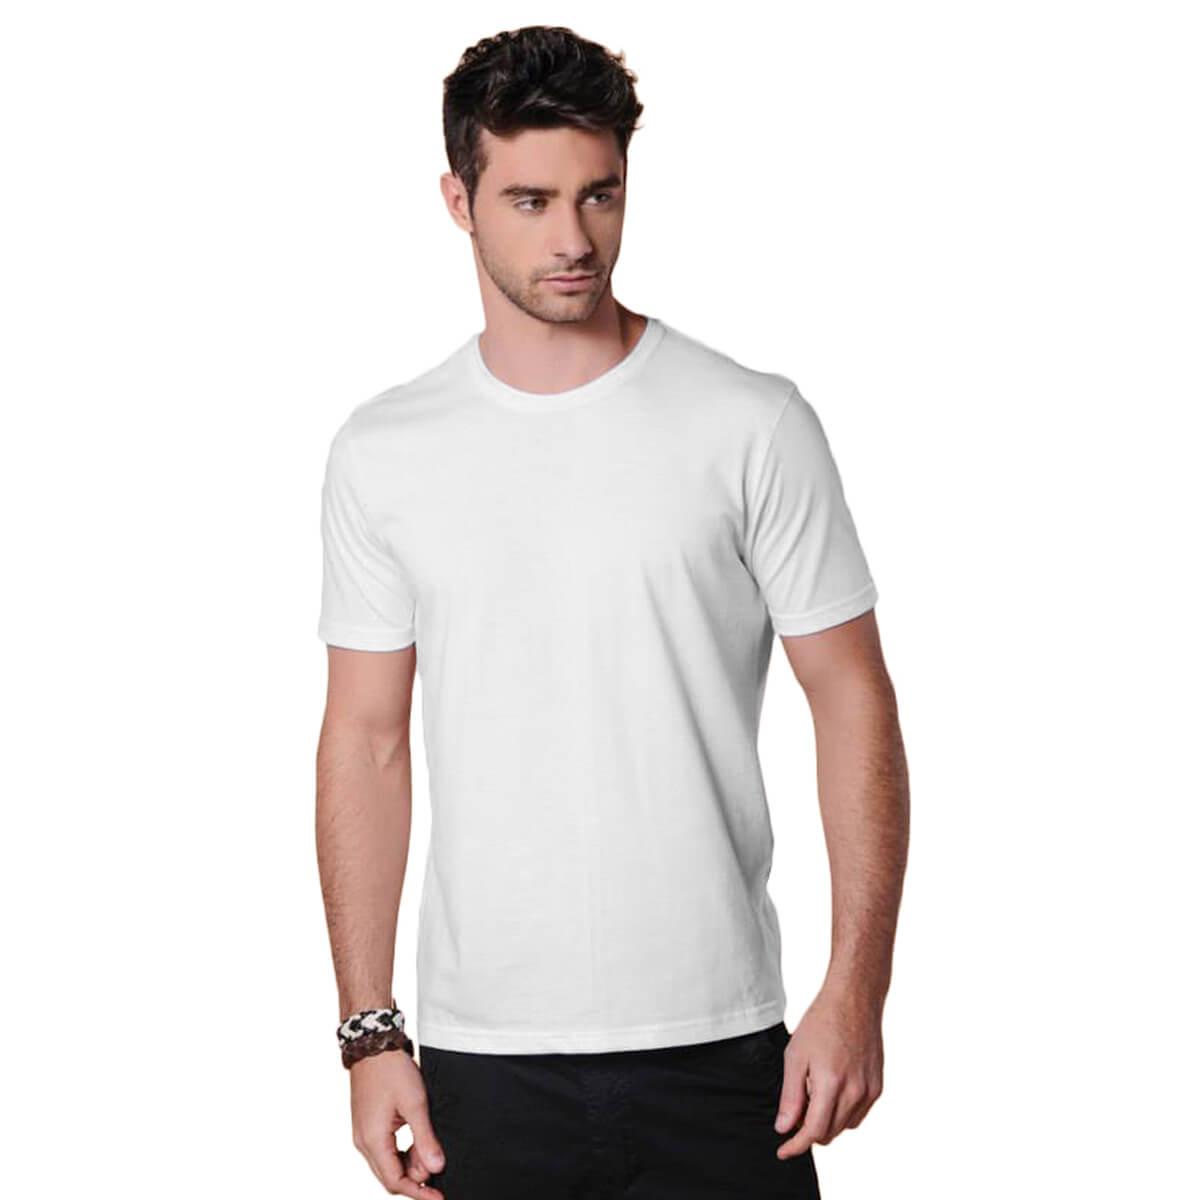 Camiseta Masculina Básica Comfort Branca